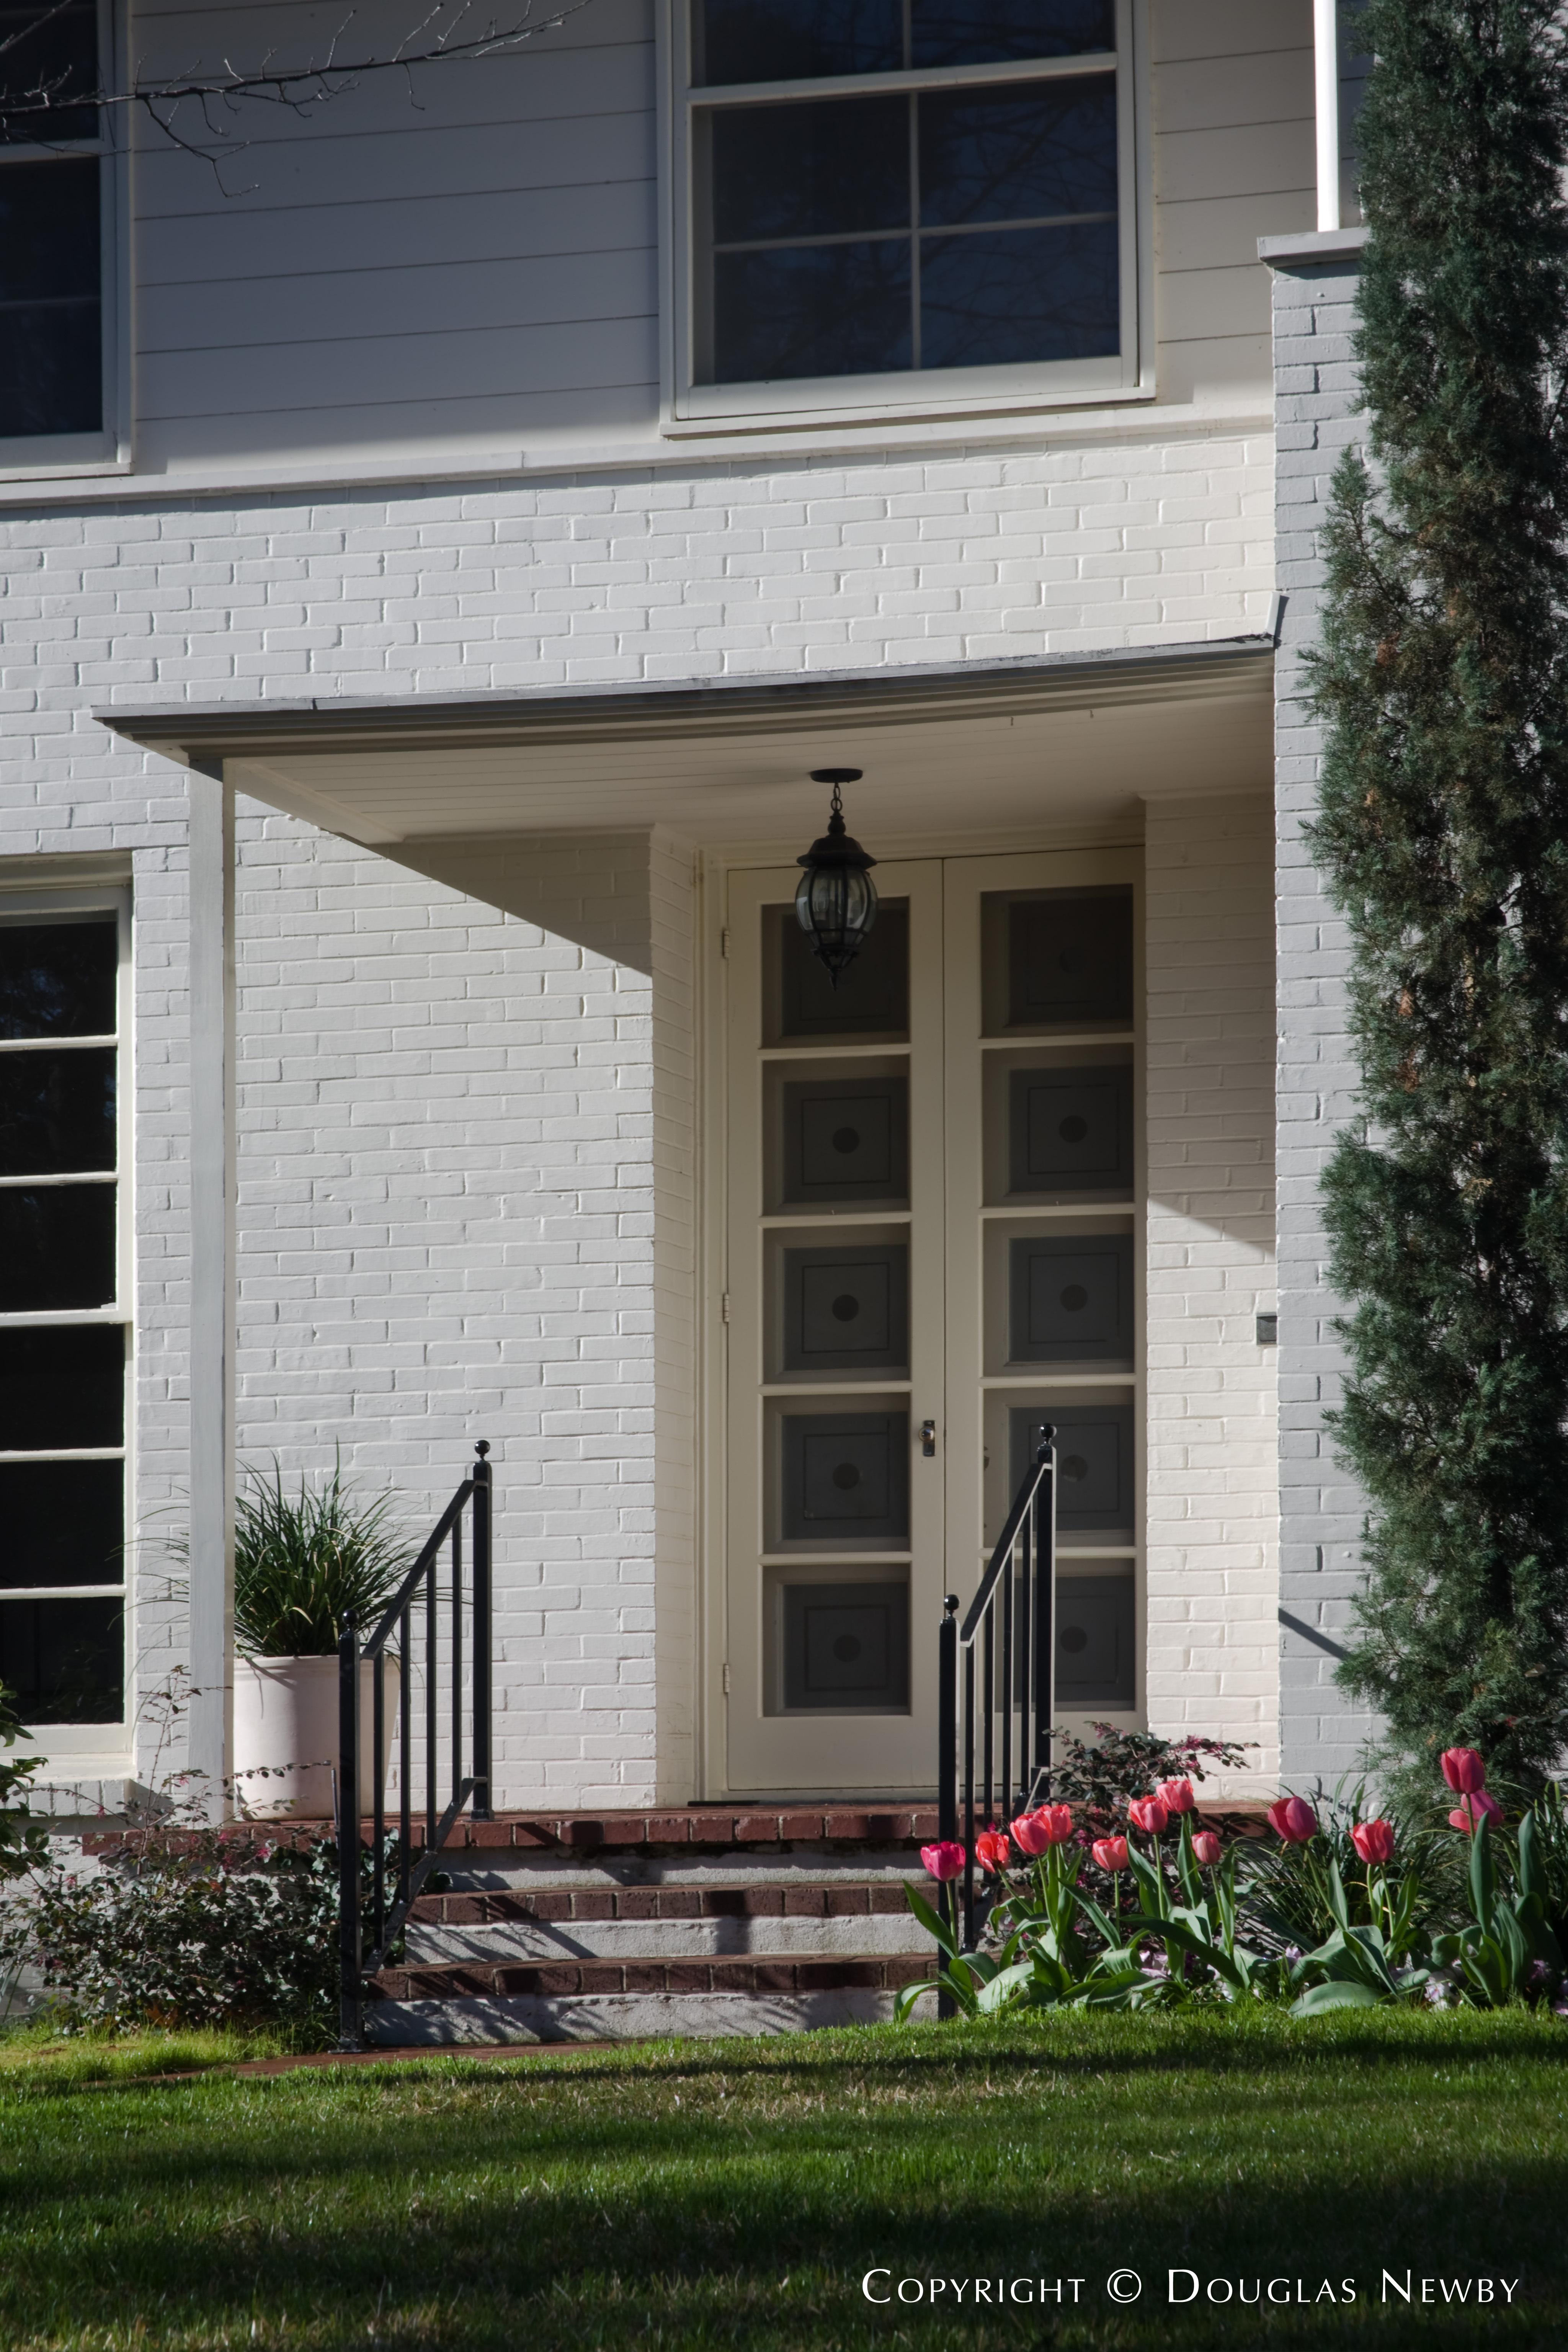 Architect O'Neil Ford Designed Texas Modern Home in Turtle Creek Corridor